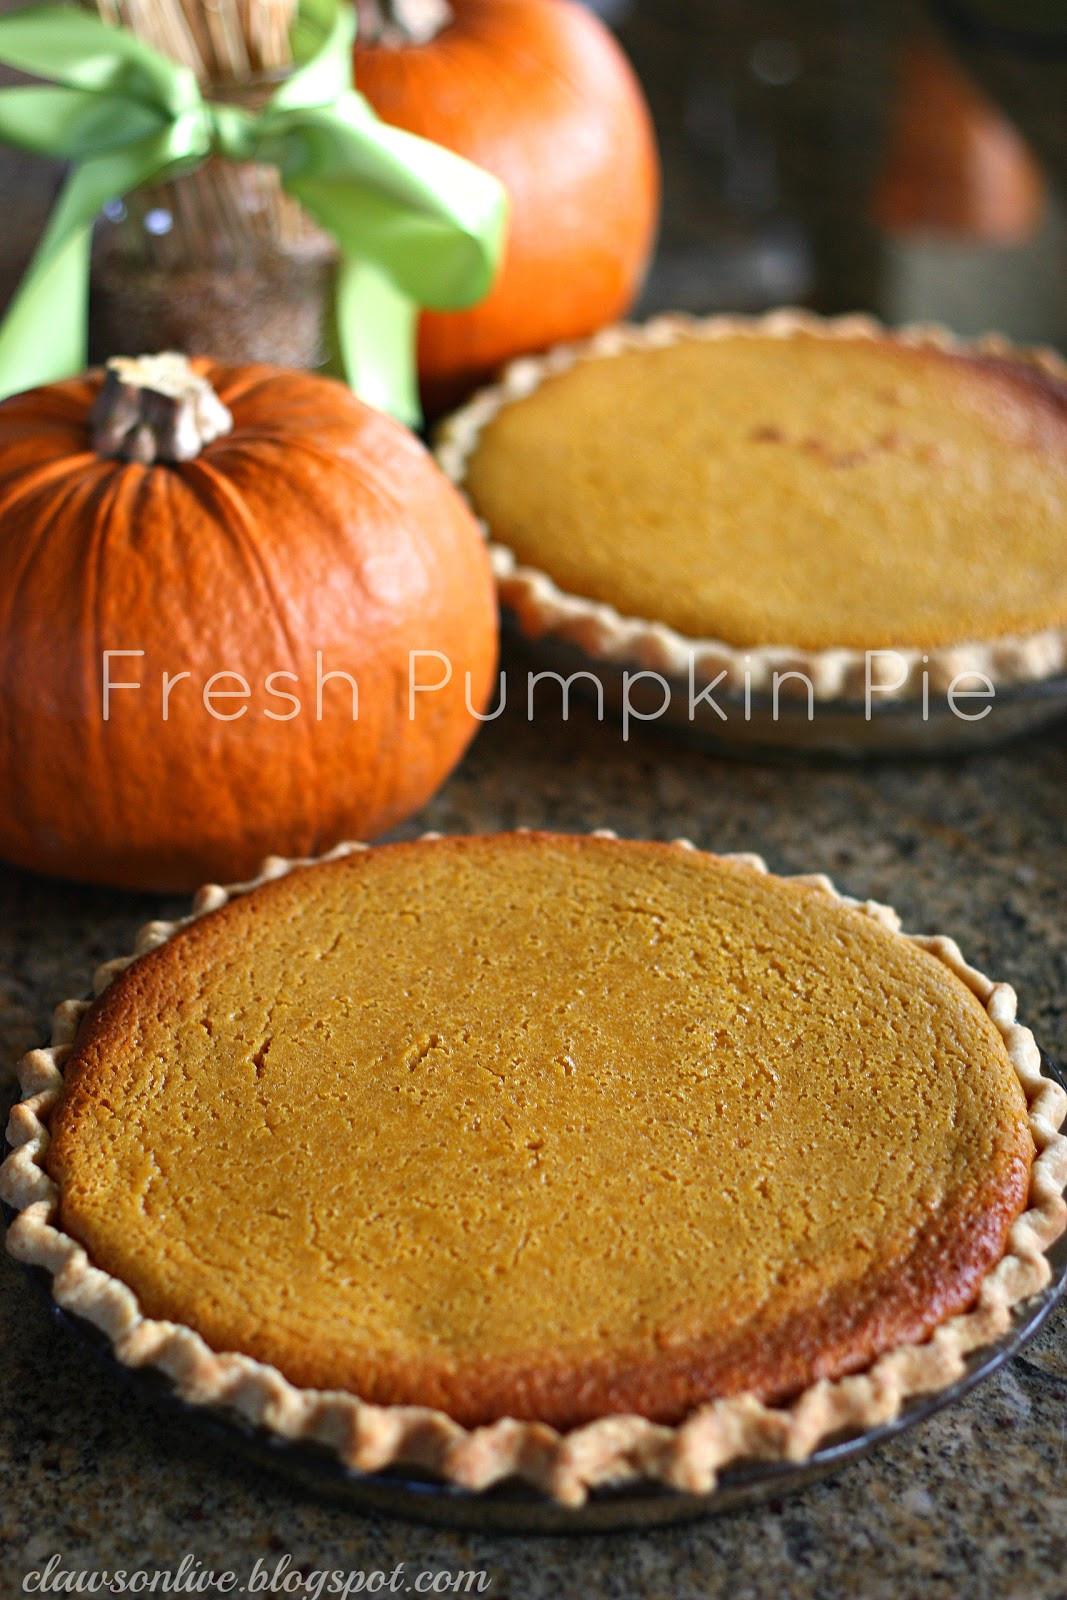 Pumpkin Pie Recipe With Real Pumpkin  Clawson Live Pumpkin Pie Made with a real pumpkin